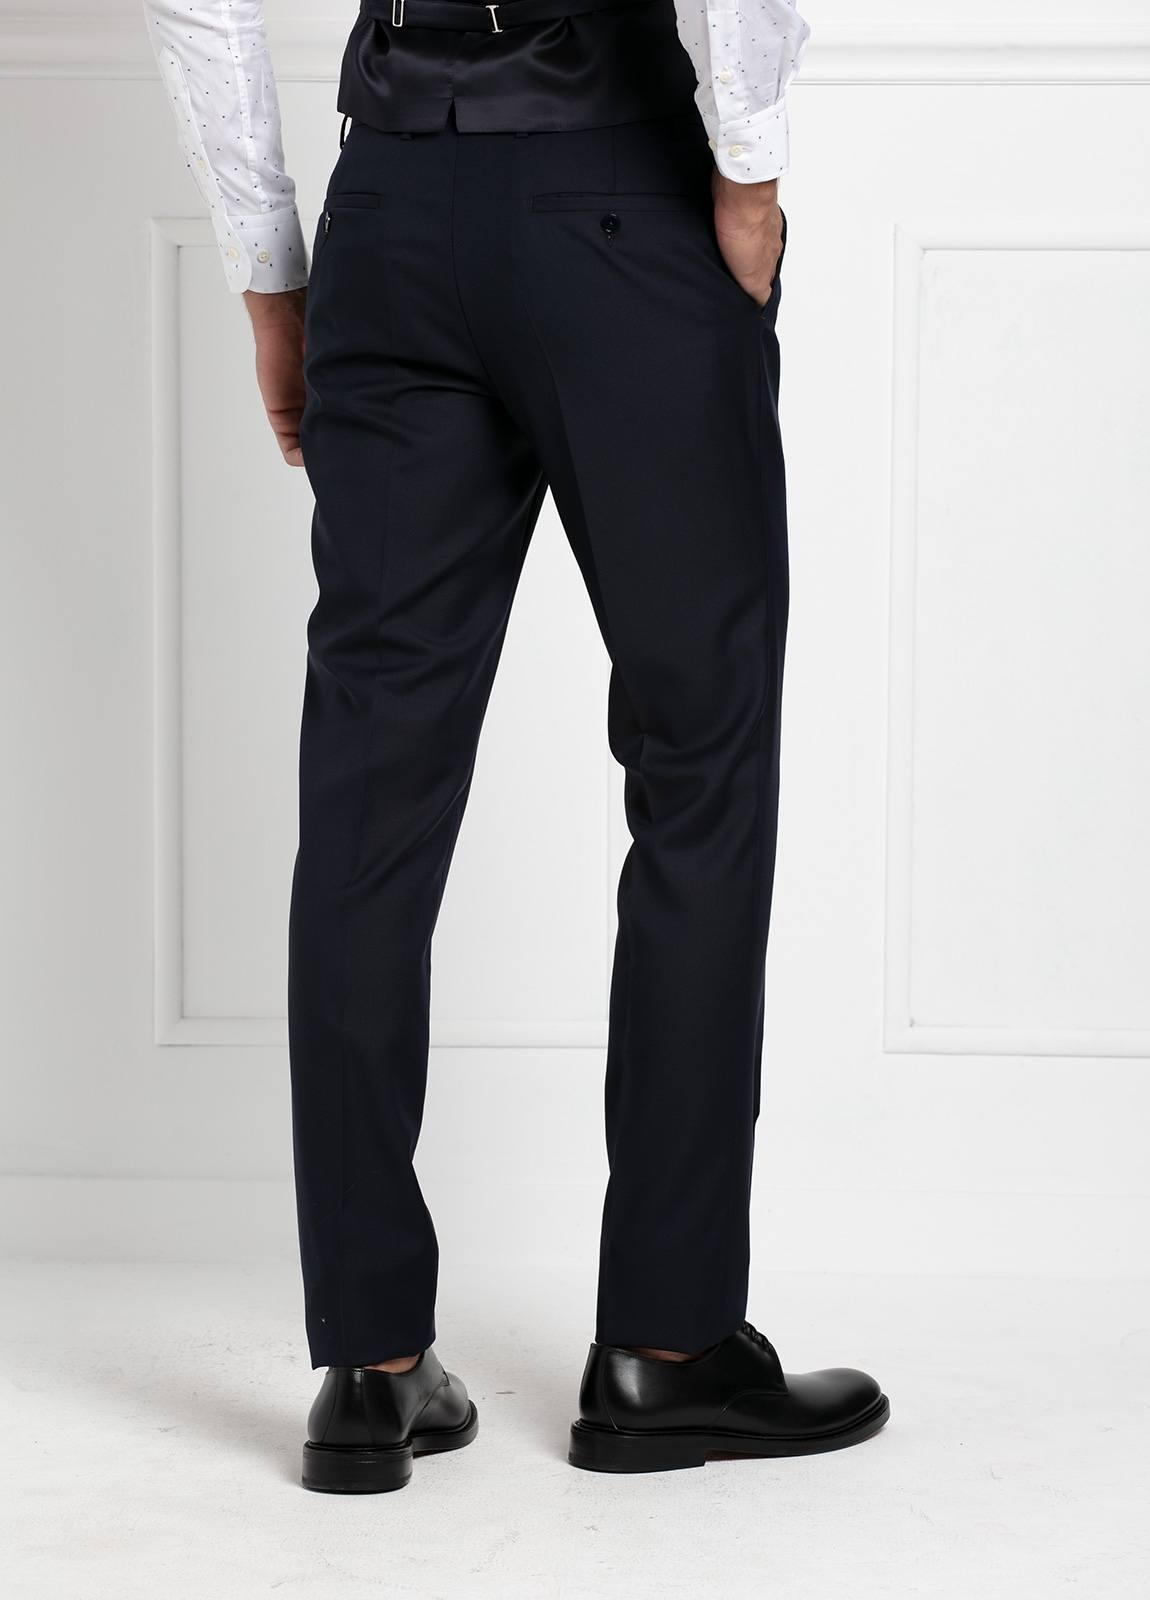 Traje liso SLIM FIT, tejido VBC con chaleco incluido, color azul marino, 100% Lana. - Ítem3